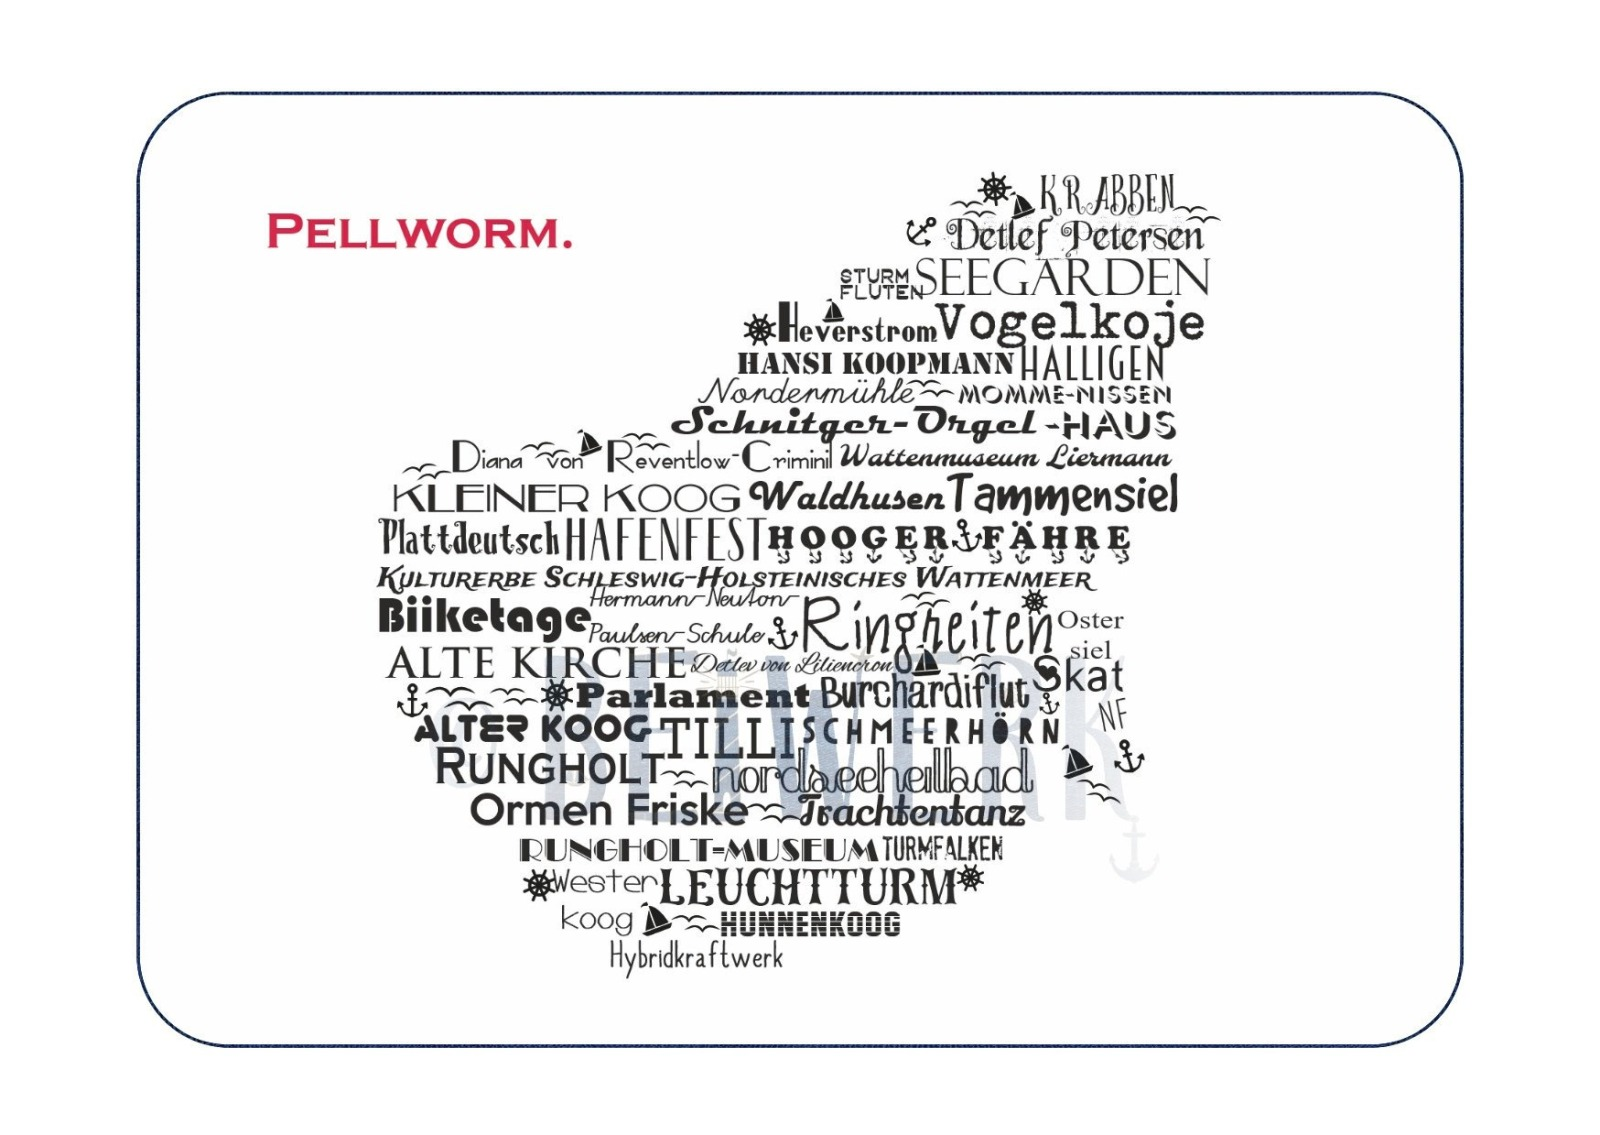 Postkarte Pellworm - 1